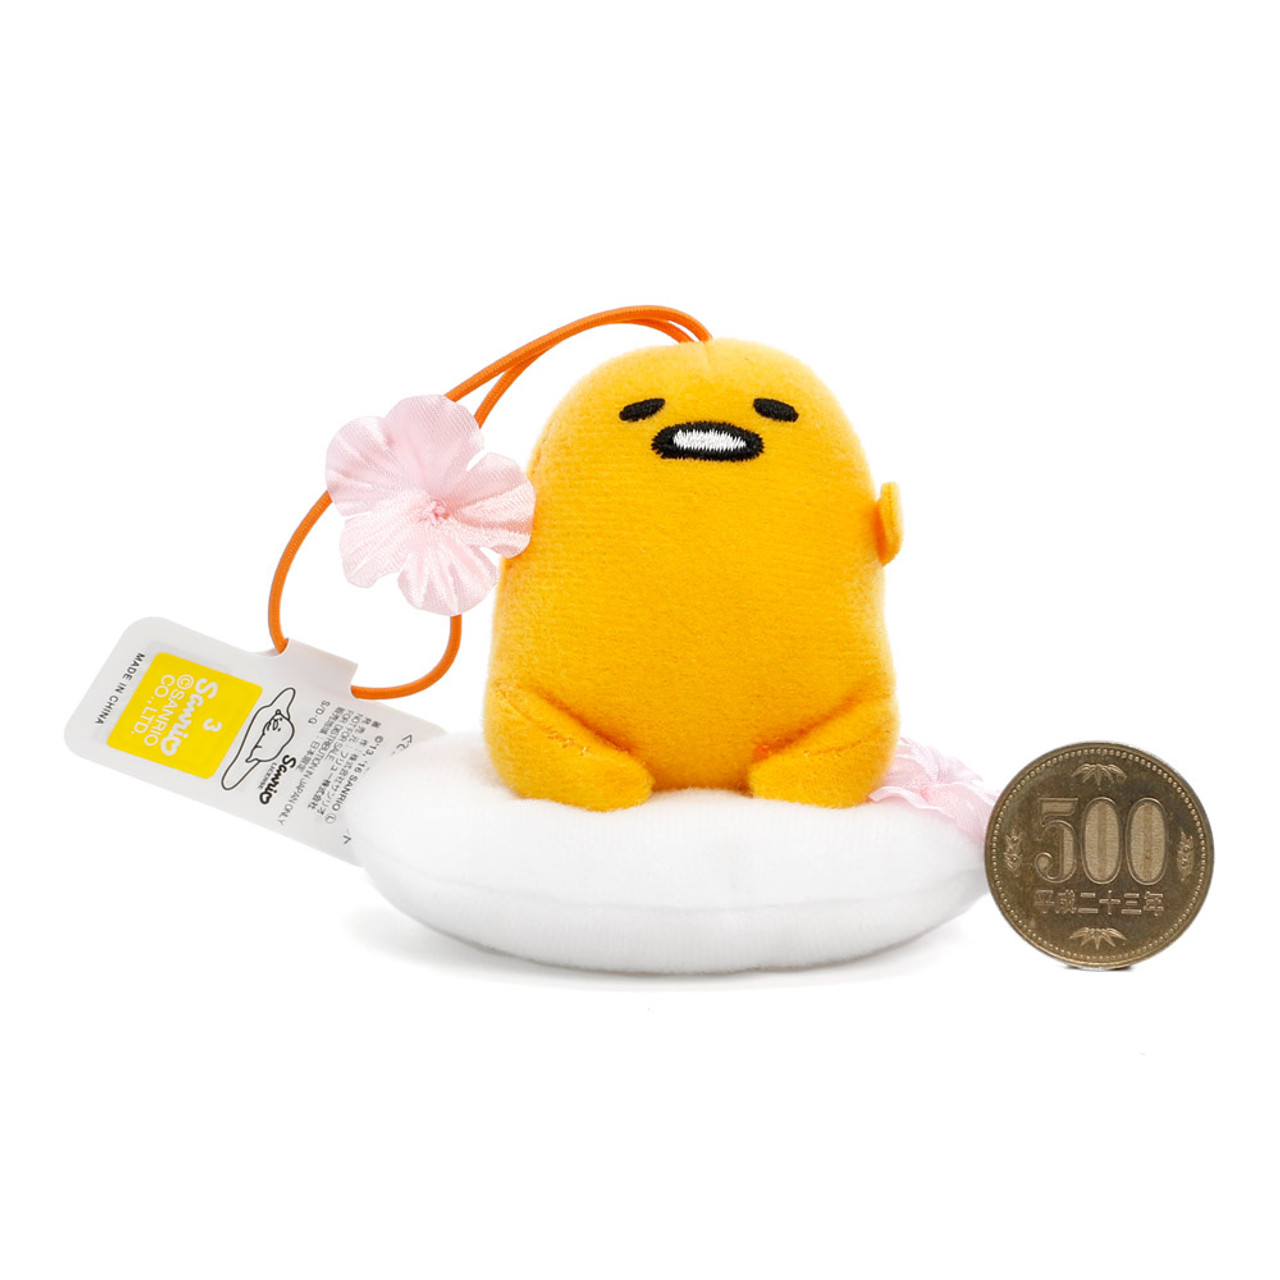 Sanrio Gudetama Lazy Egg Sakura Mascot Plush Charms - Sitting On Sakura Egg White ( Proportion )